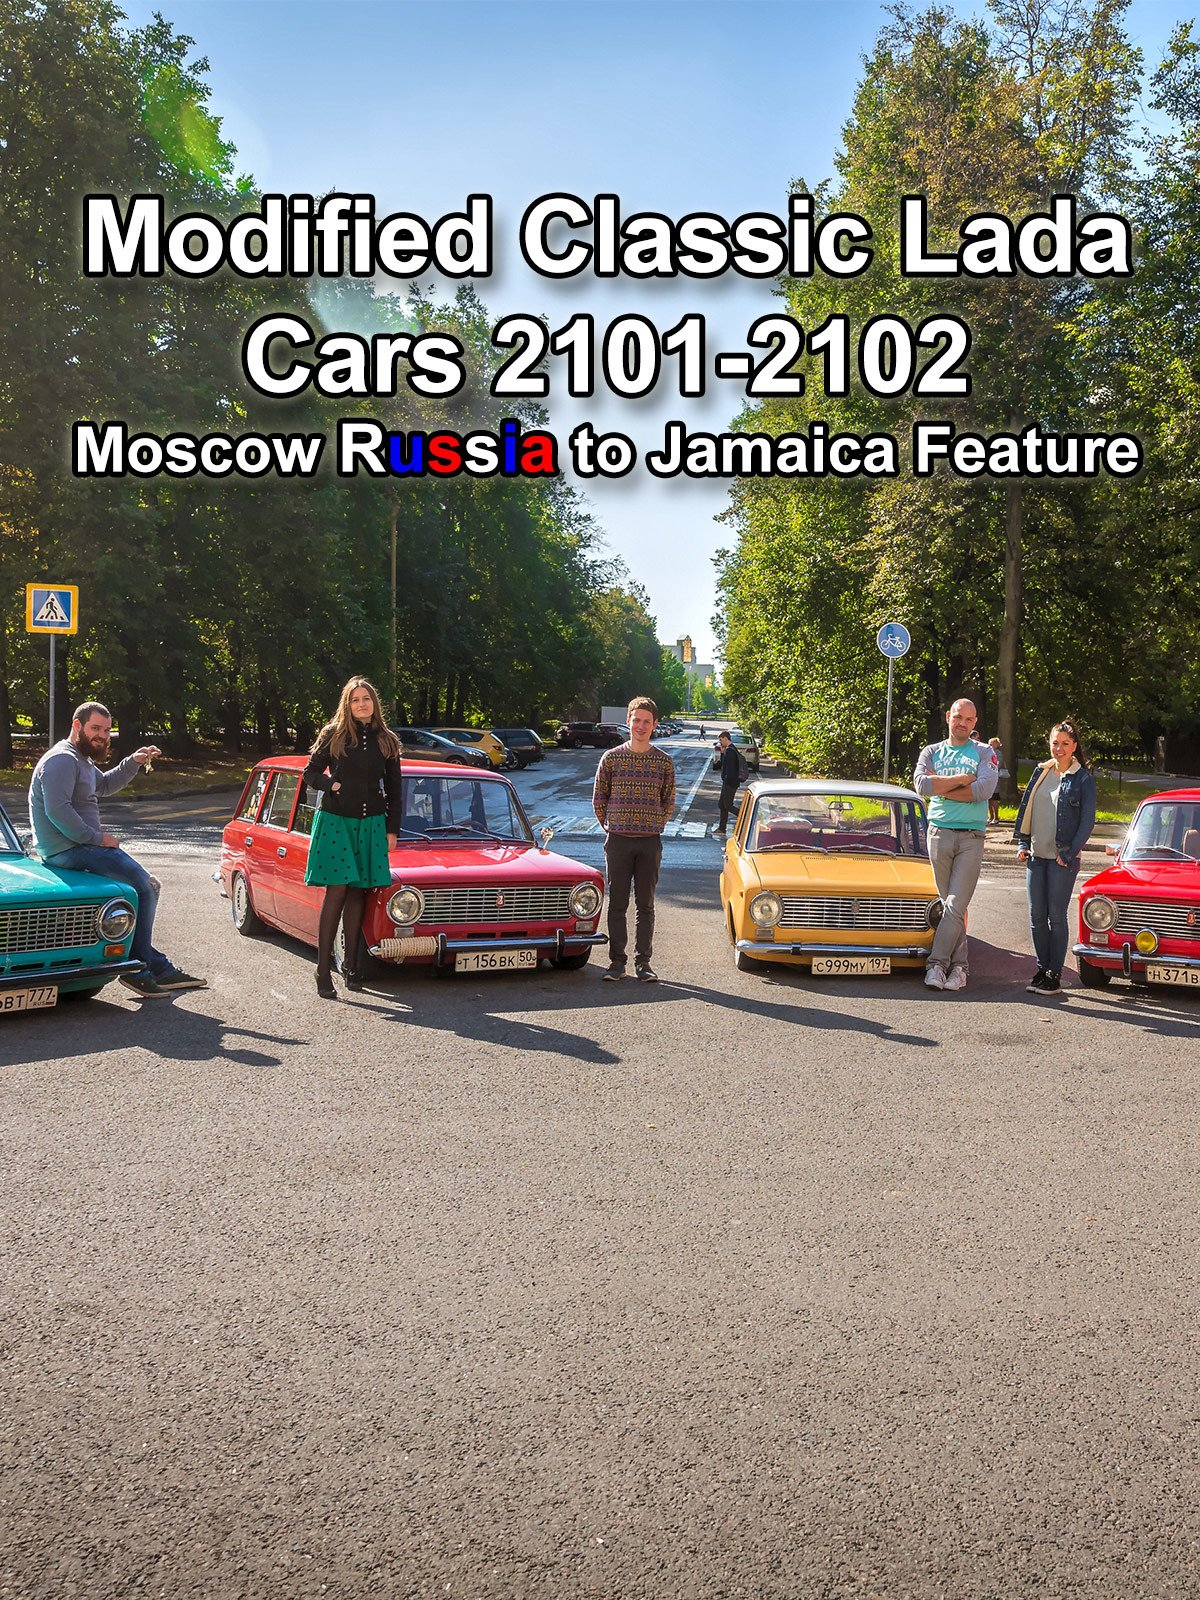 Modified Classic Lada Cars 2101-2102